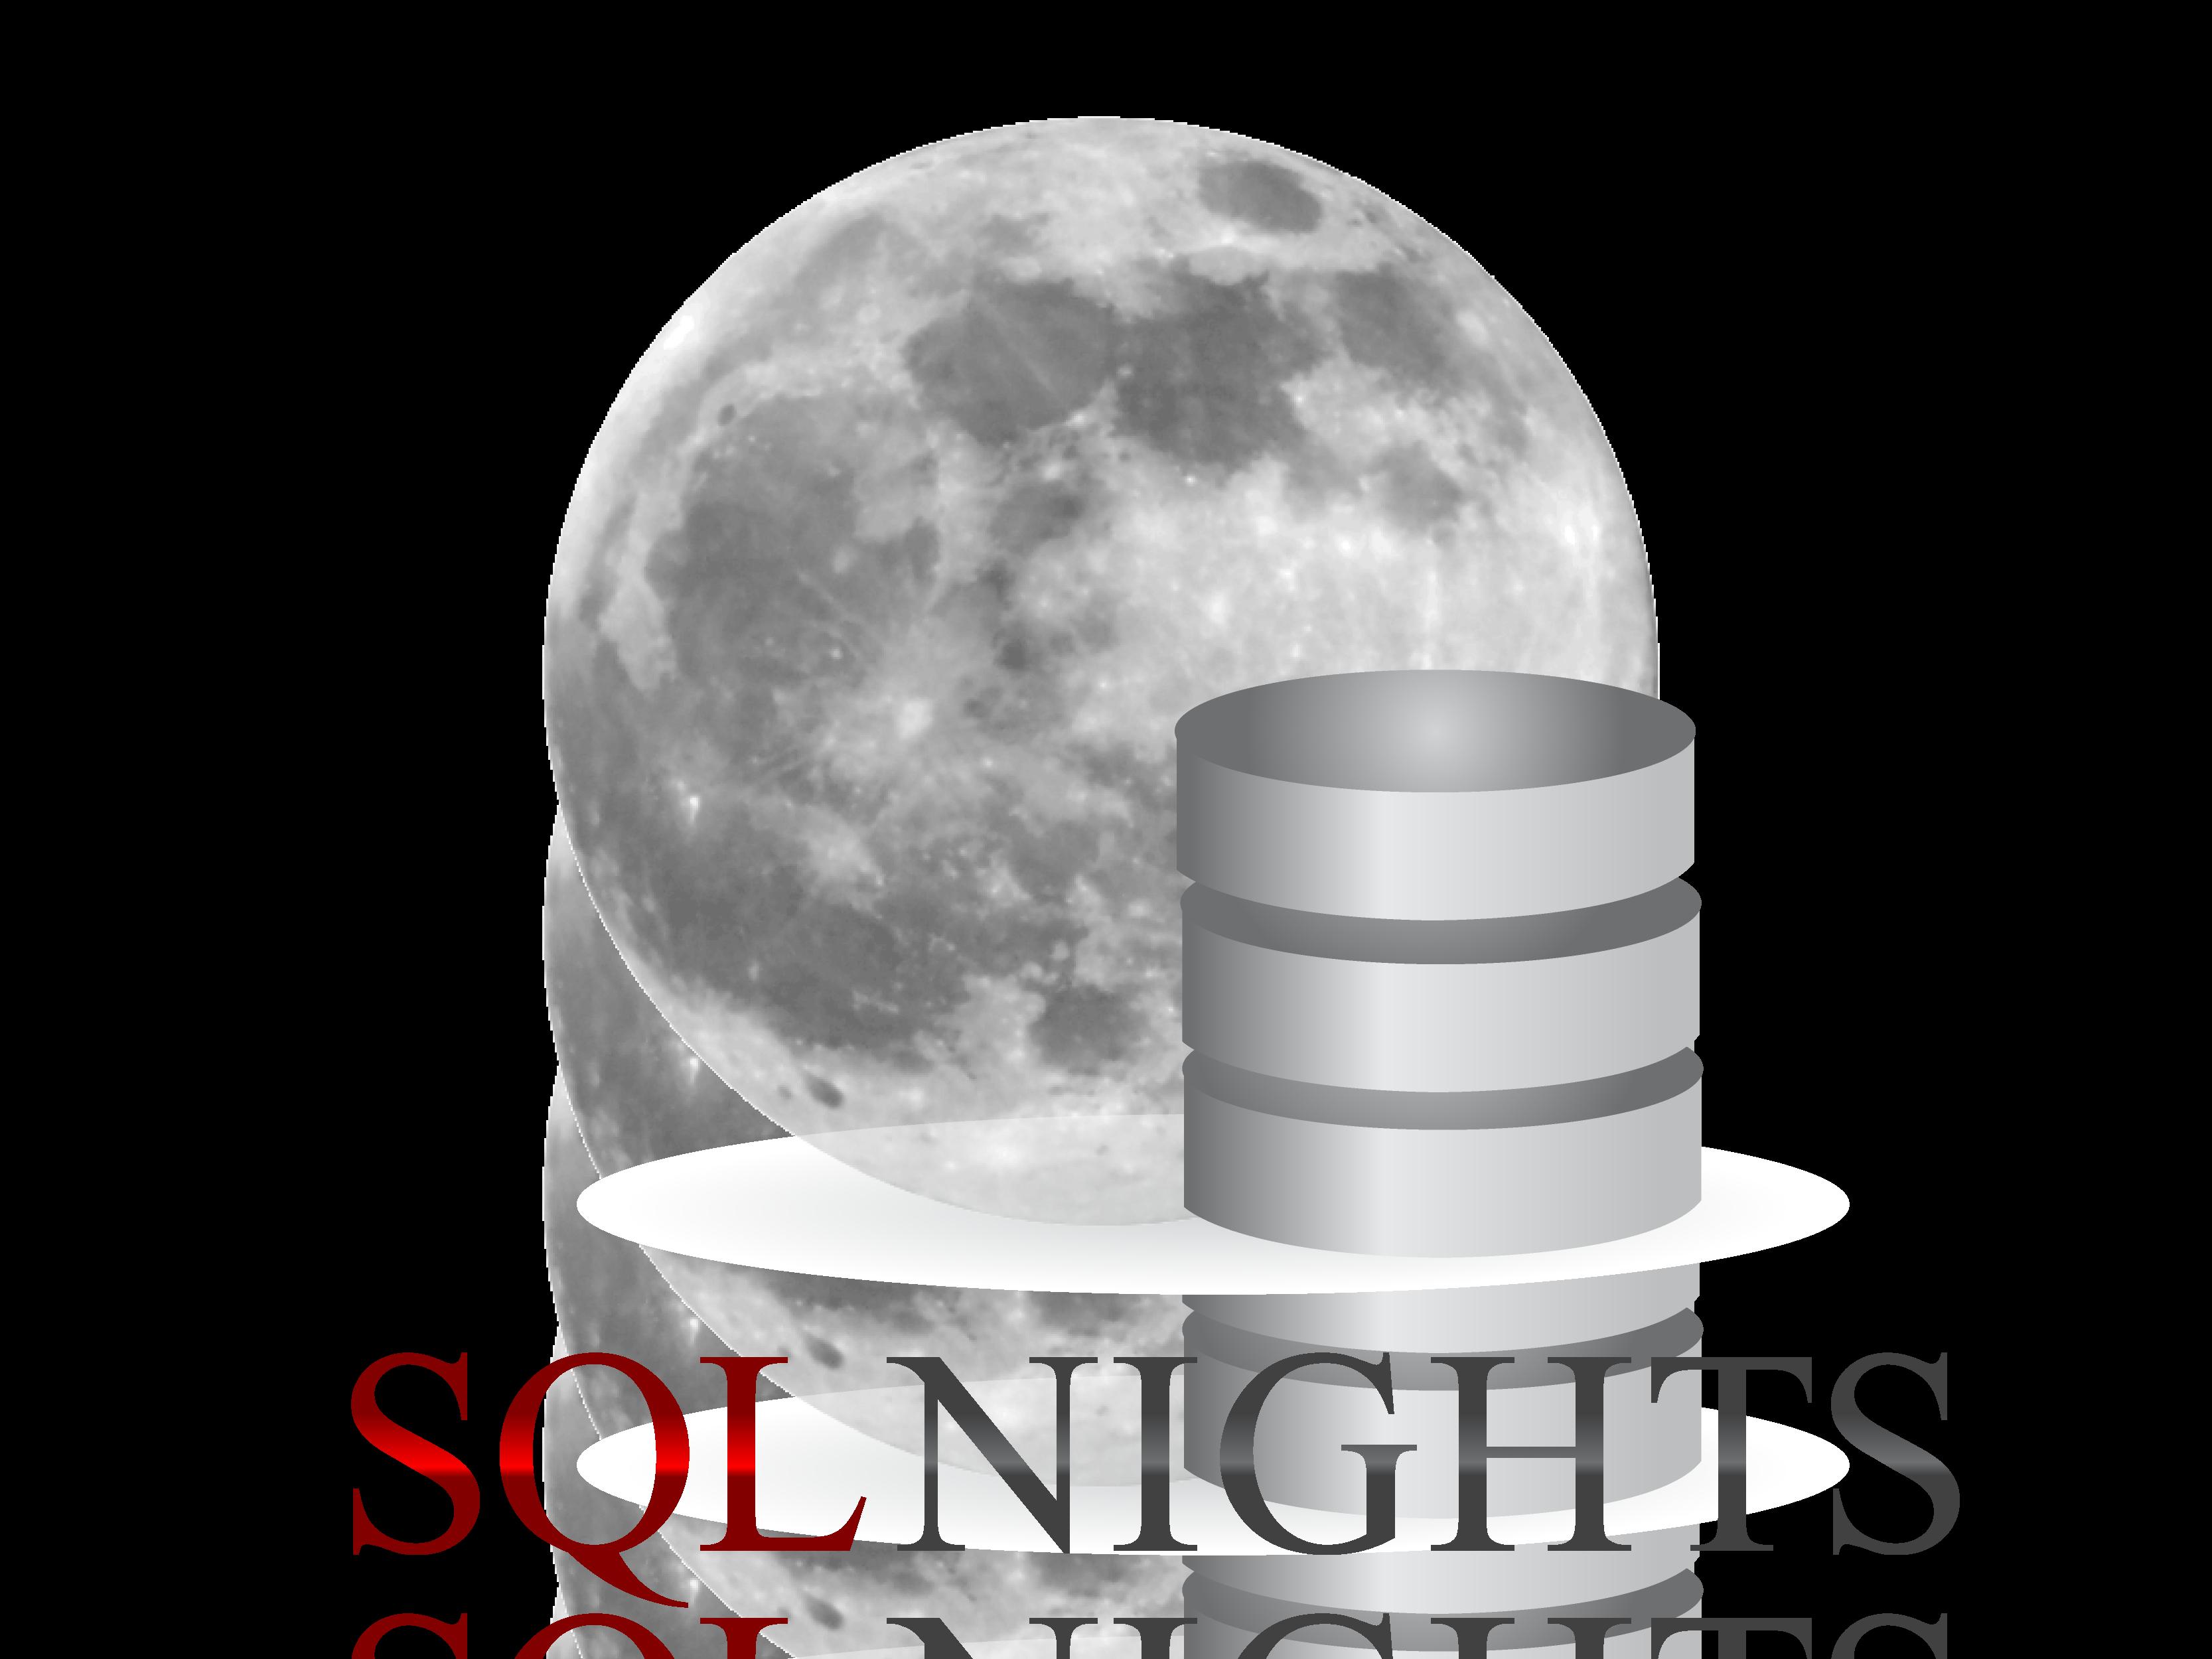 sqlnights.com